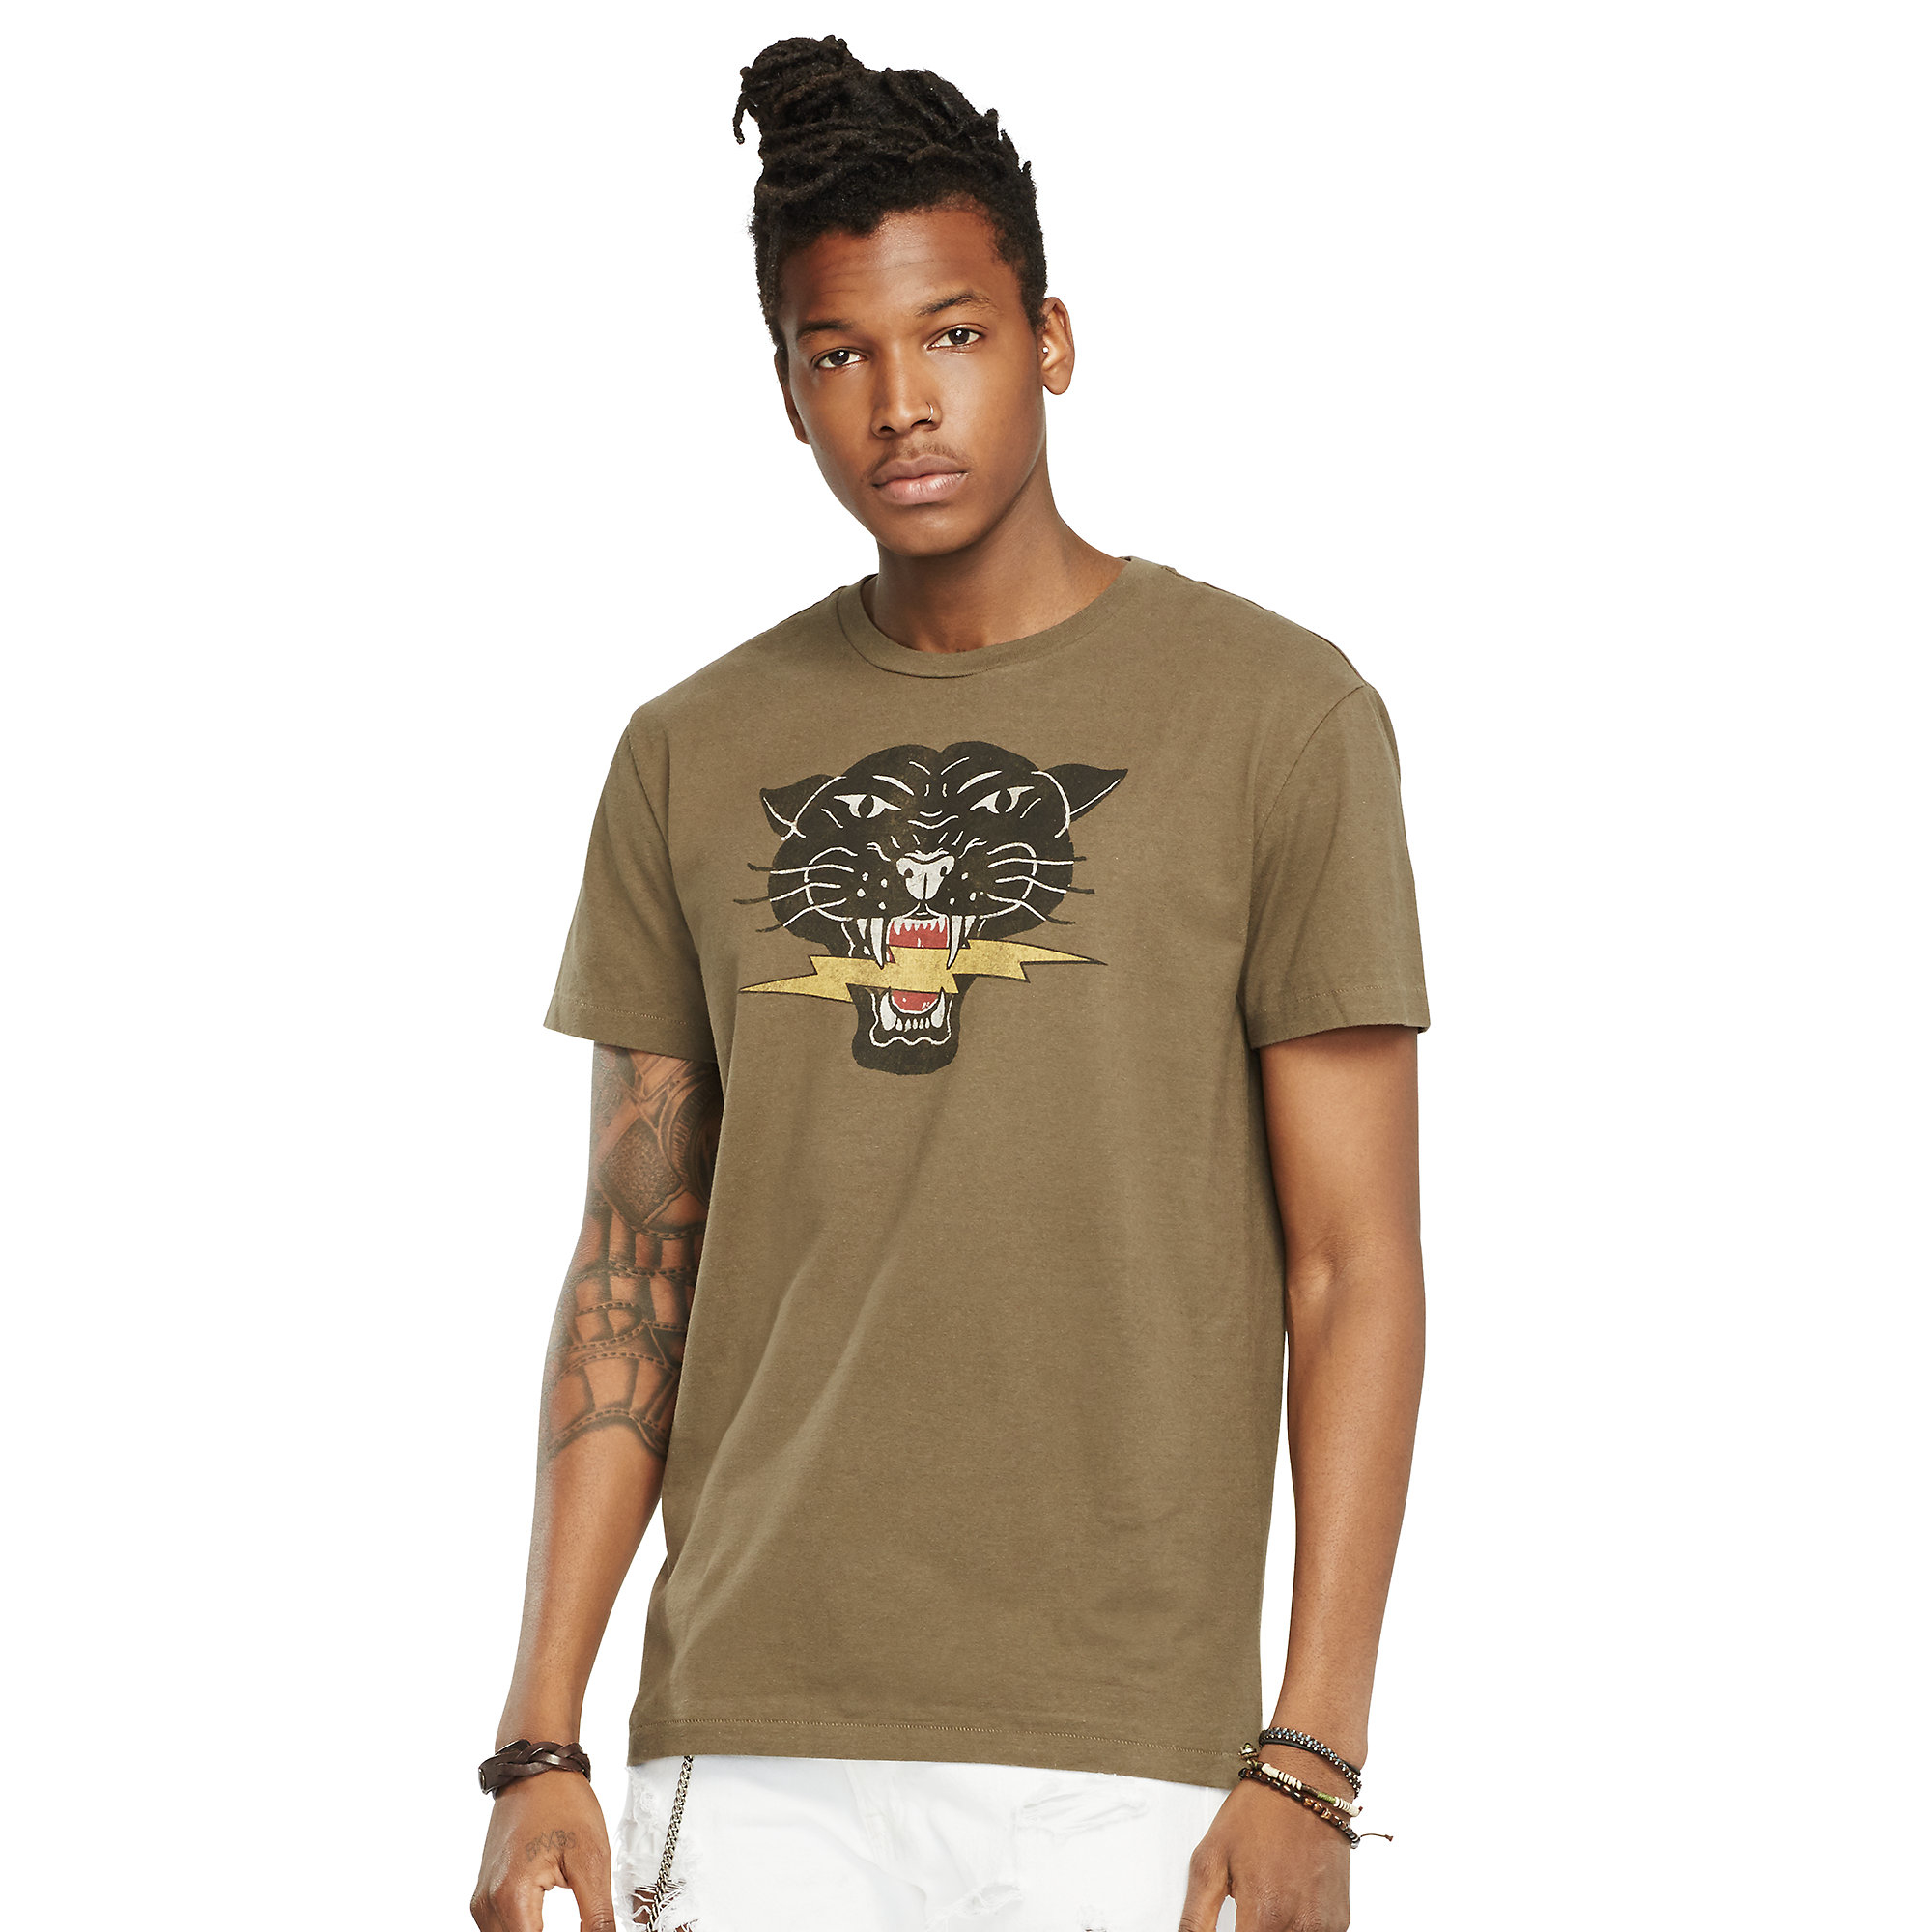 93042cbae Denim & Supply Ralph Lauren Cotton Jersey Graphic Tee in Green for Men -  Lyst